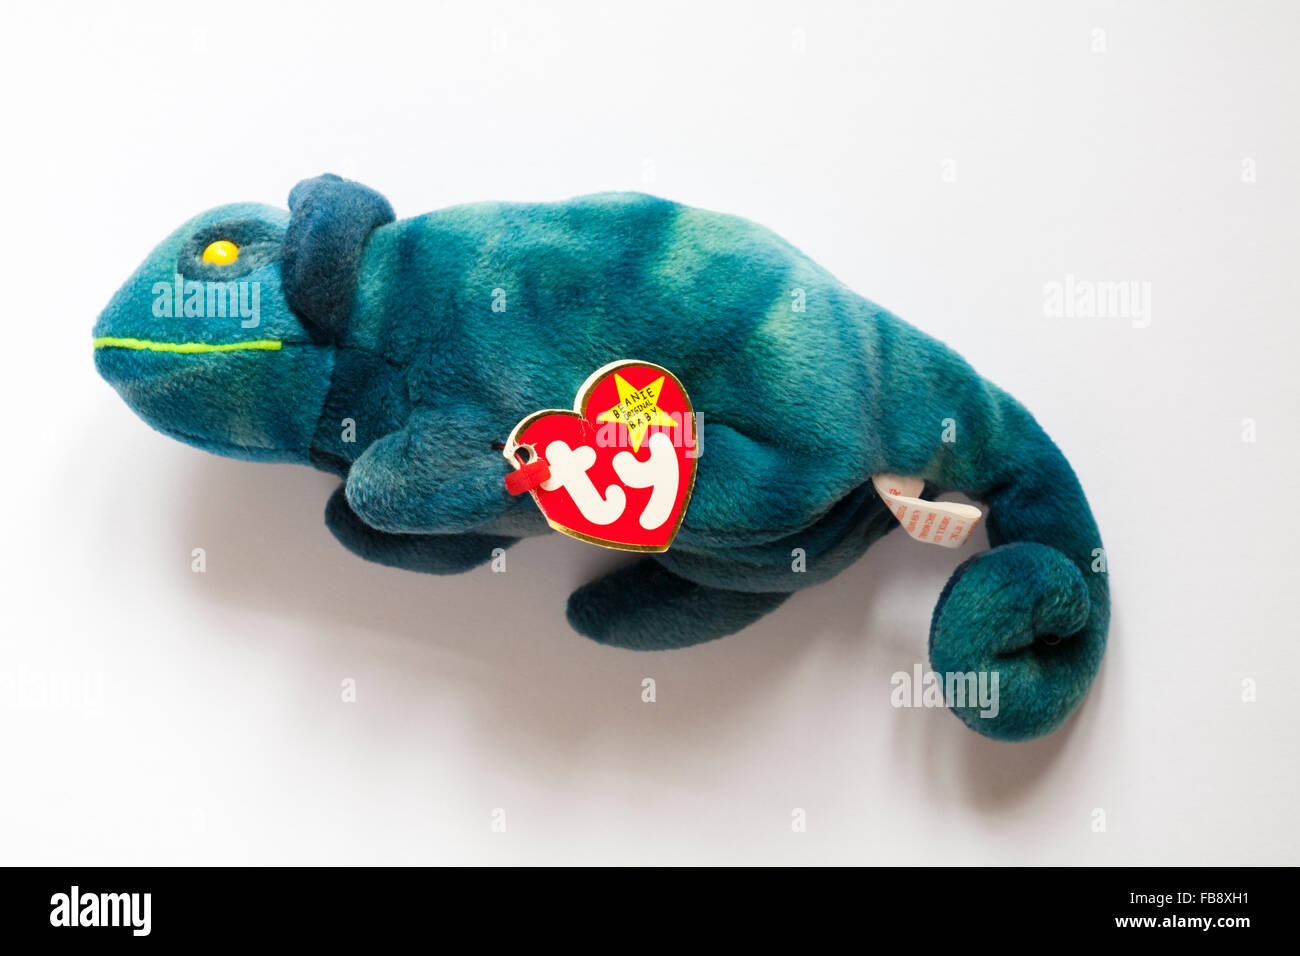 Iggy the ty-dye iguana ty beanie original baby soft cuddly toy isolated on  white background 1f3fa04095b